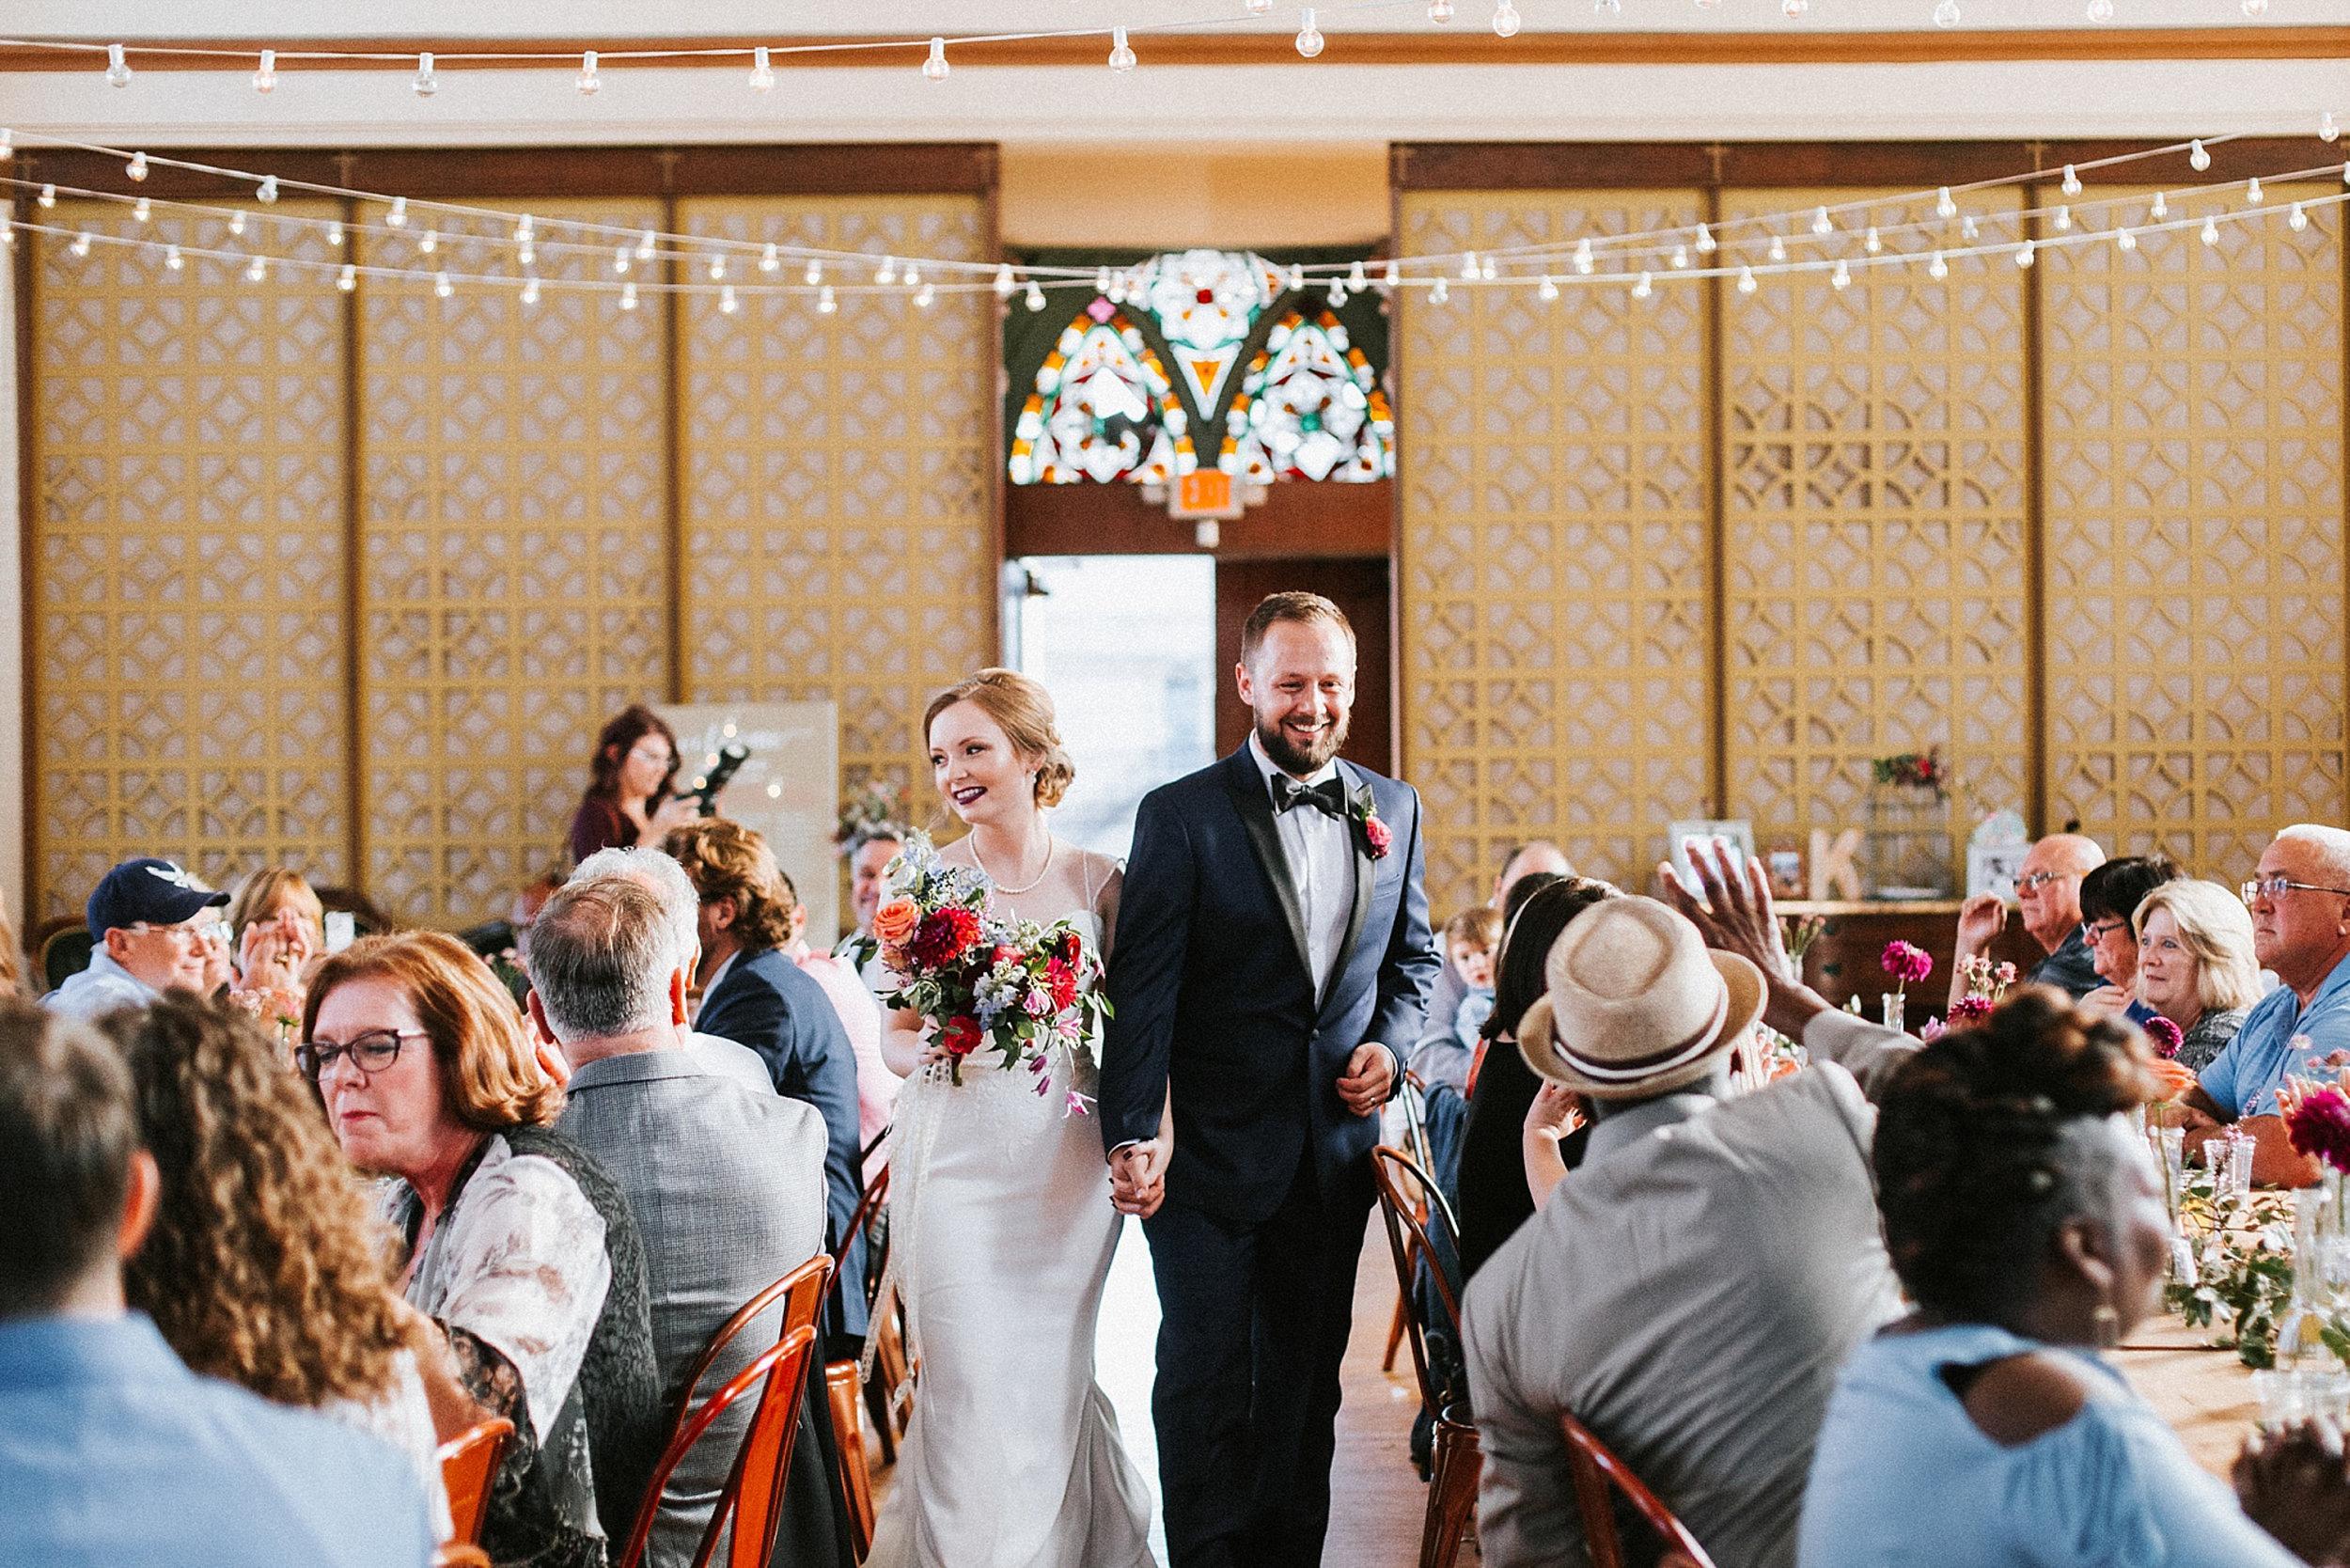 Brooke Townsend Photography - Ohio Wedding Photographer-184.jpg